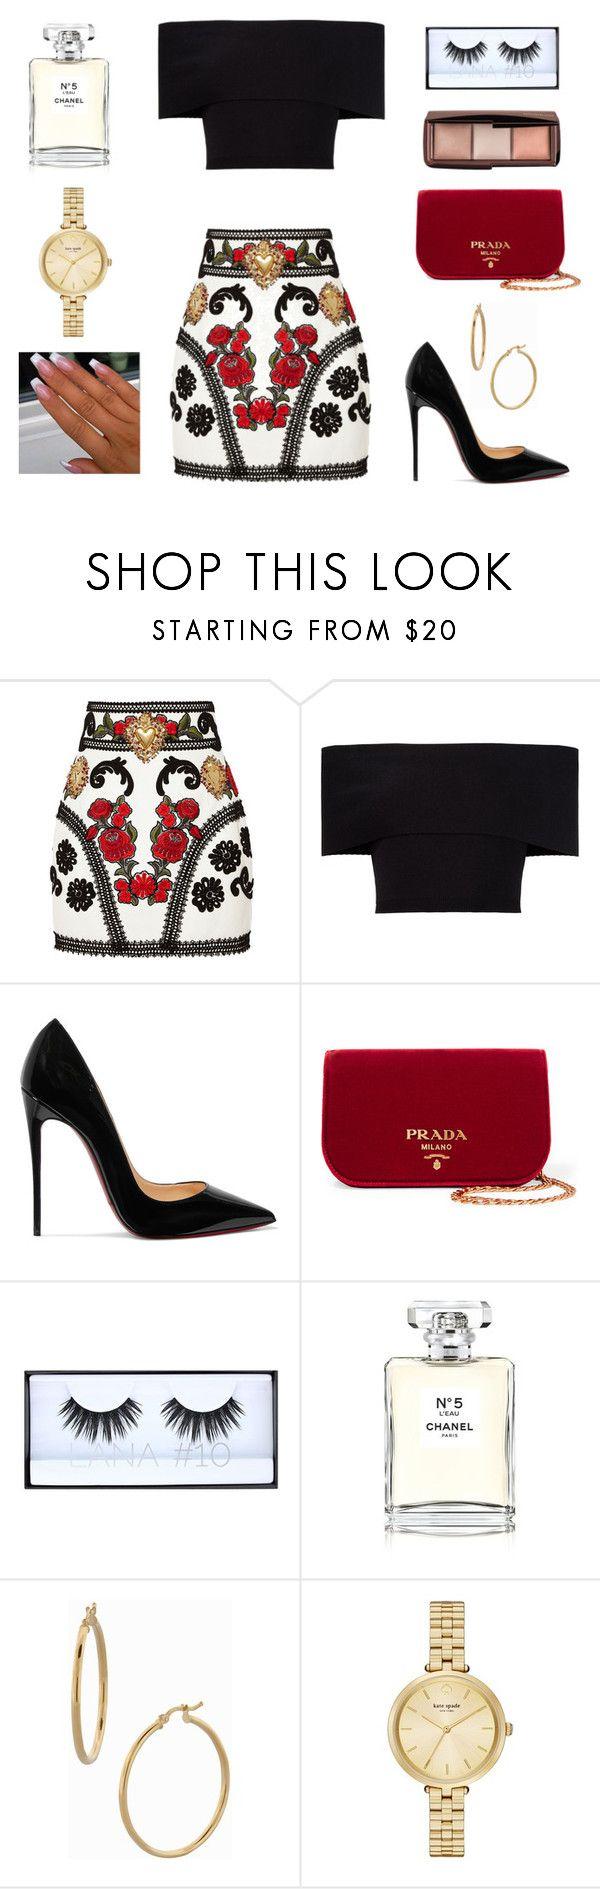 """✨"" by oliviacarolineantonia ❤ liked on Polyvore featuring Dolce&Gabbana, Rosetta Getty, Christian Louboutin, Prada, Huda Beauty, Chanel, Bony Levy and Kate Spade"